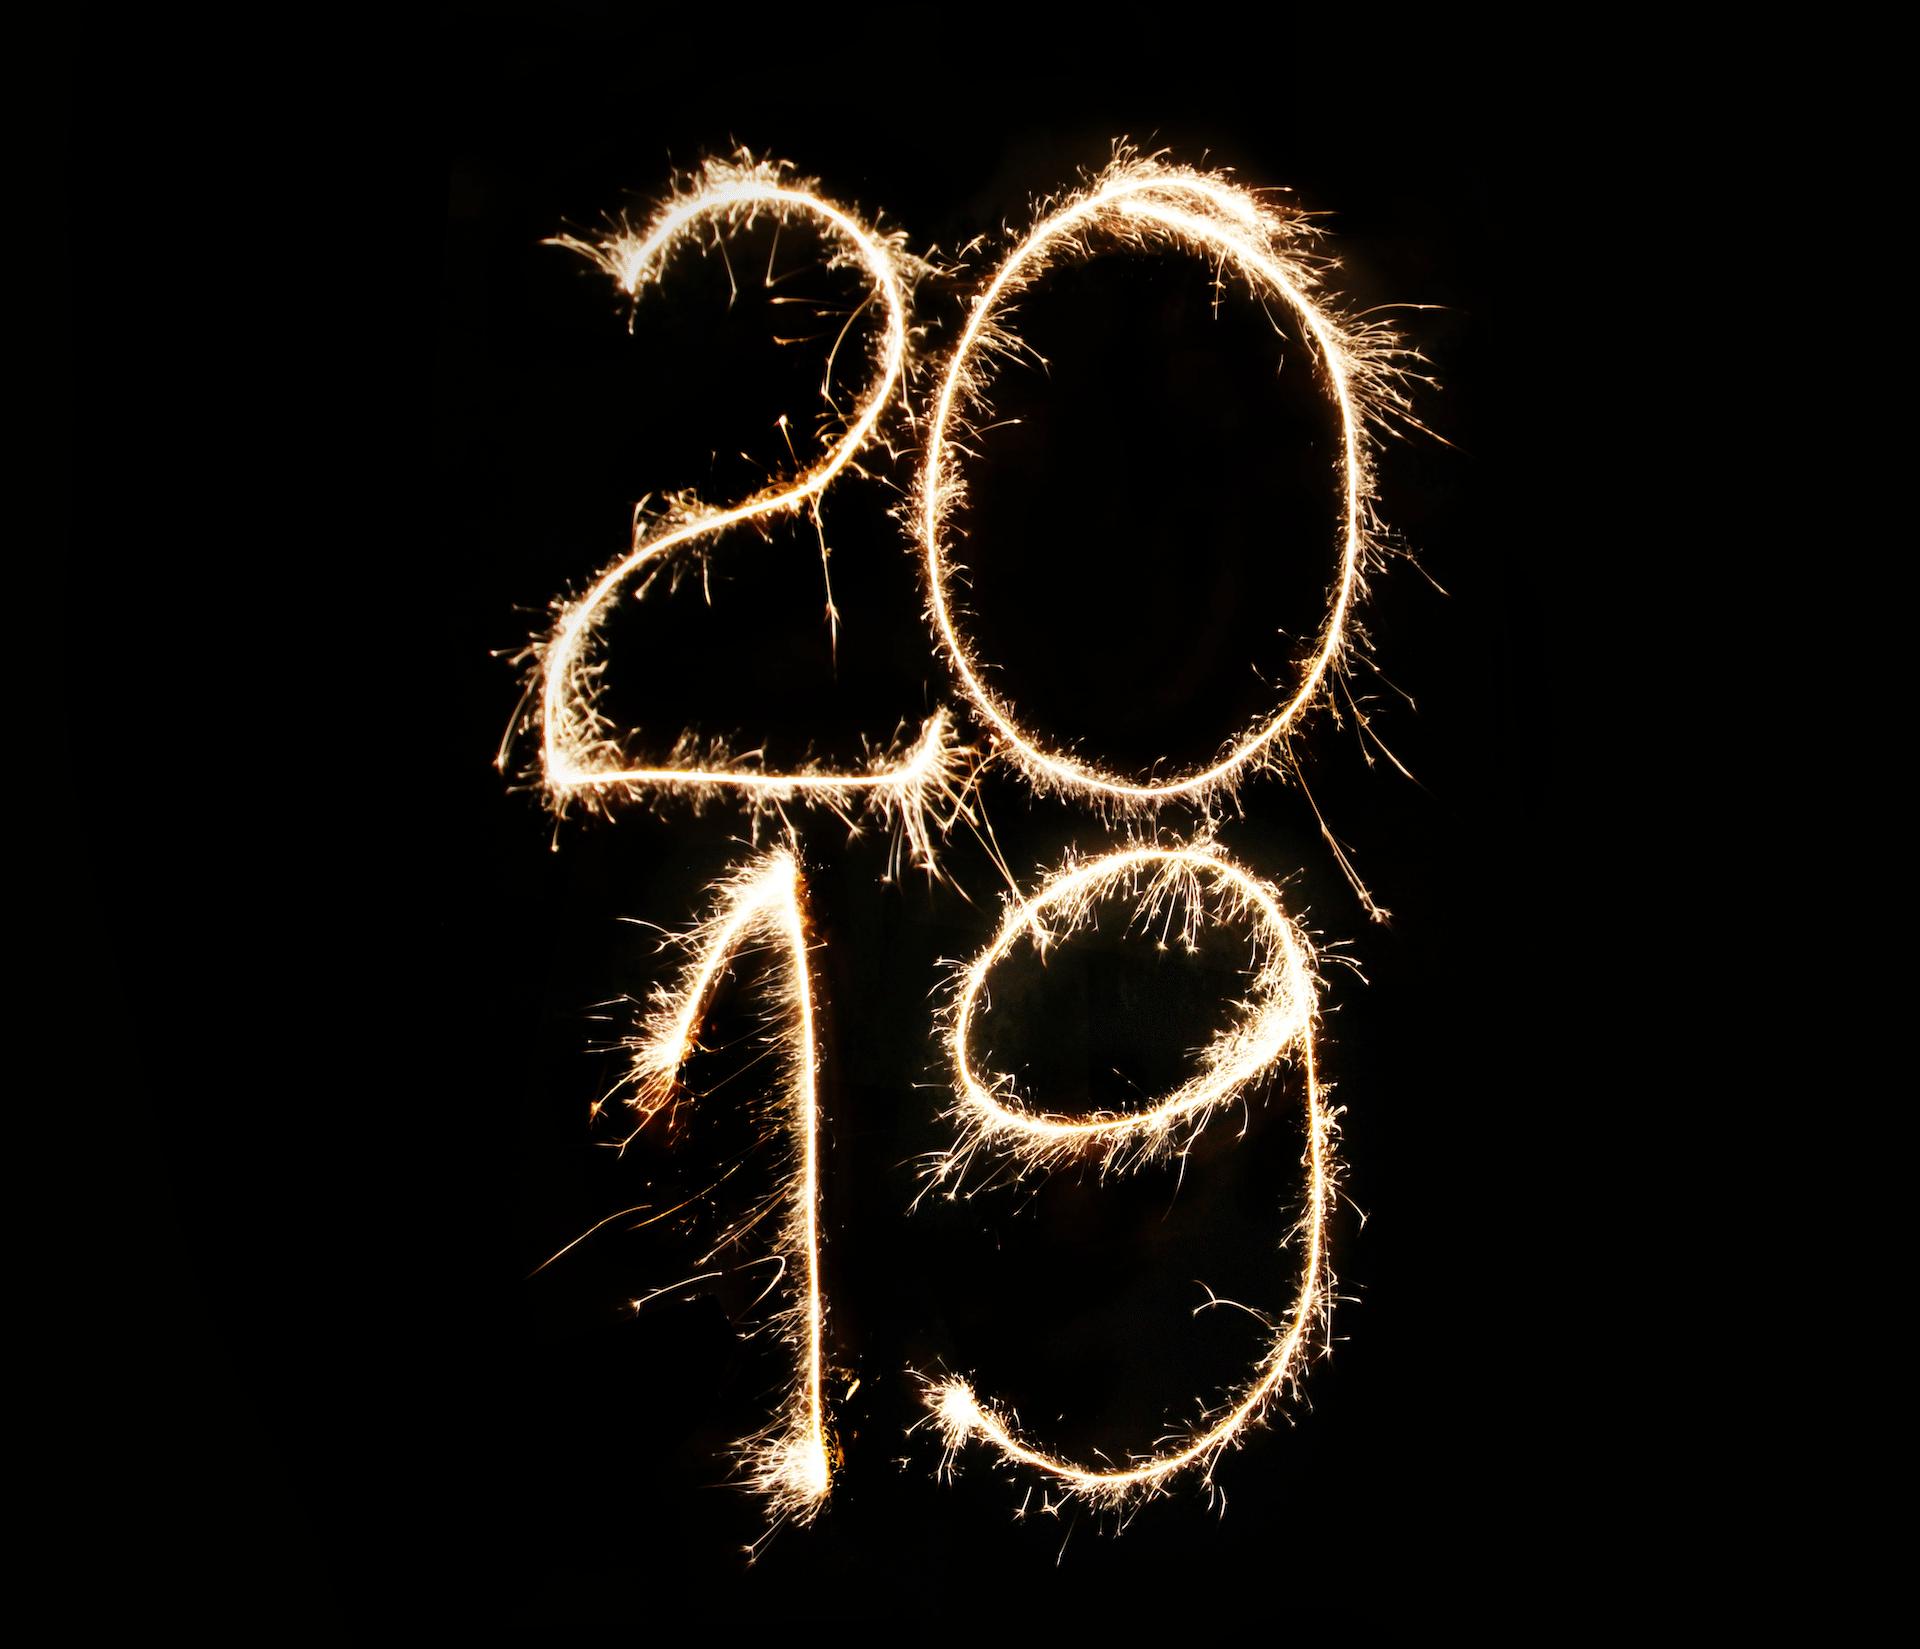 2019 Un año difícil pero decisivo